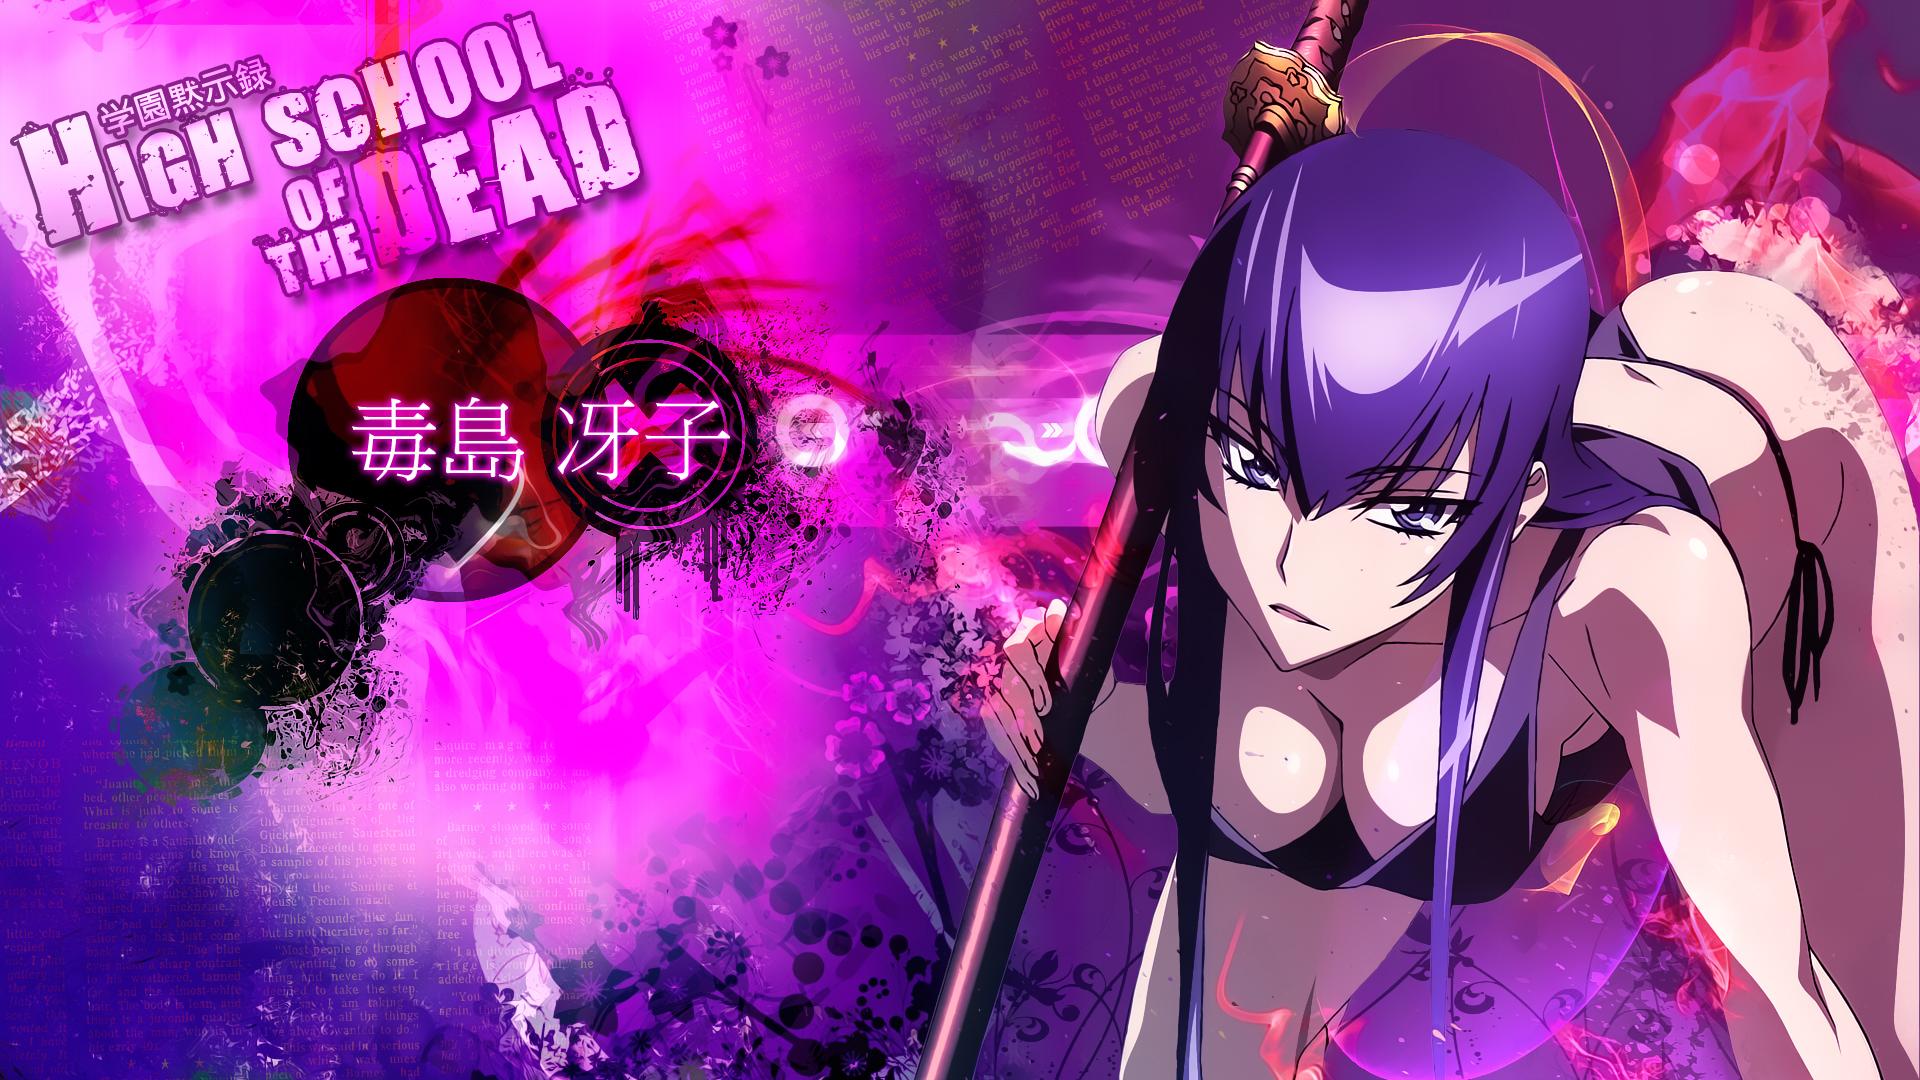 Wallpaper Anime Girls Highschool Of The Dead Busujima Saeko